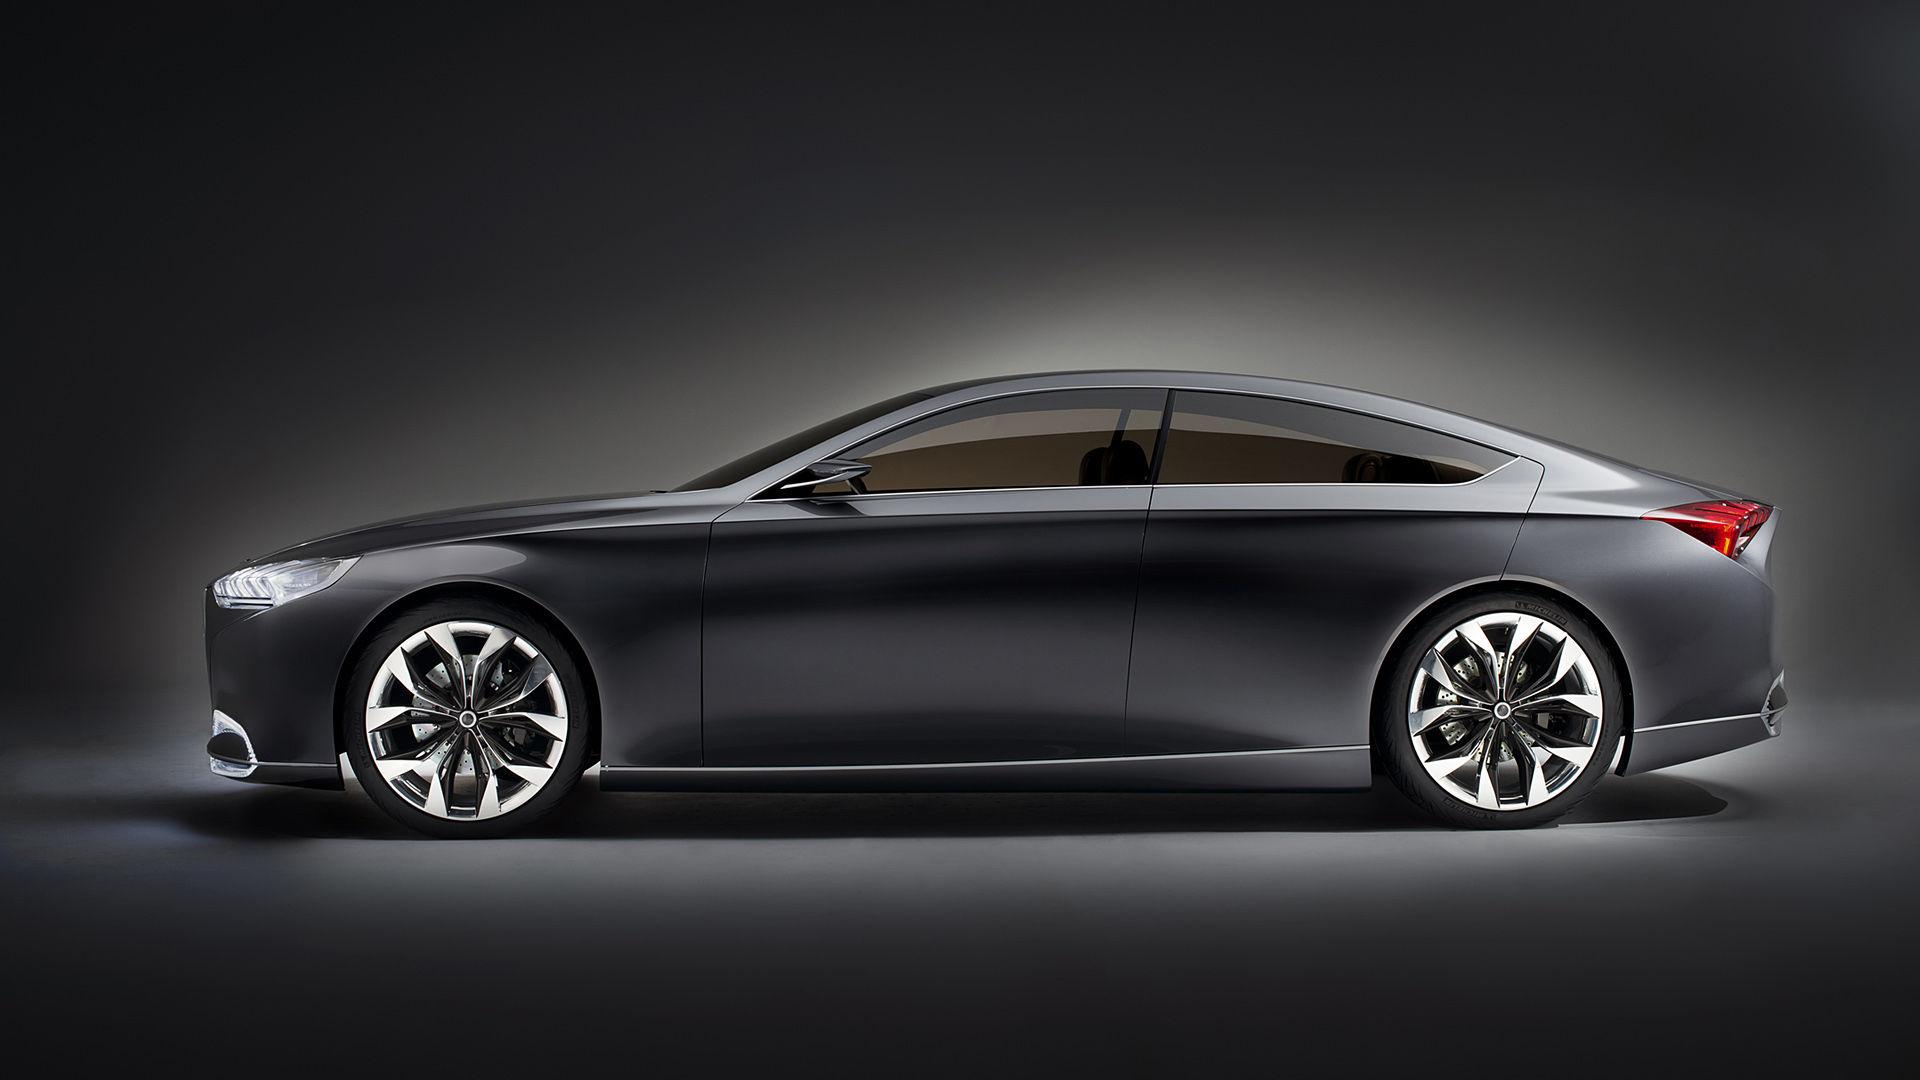 2013 Hyundai HCD-14 Genesis Concept